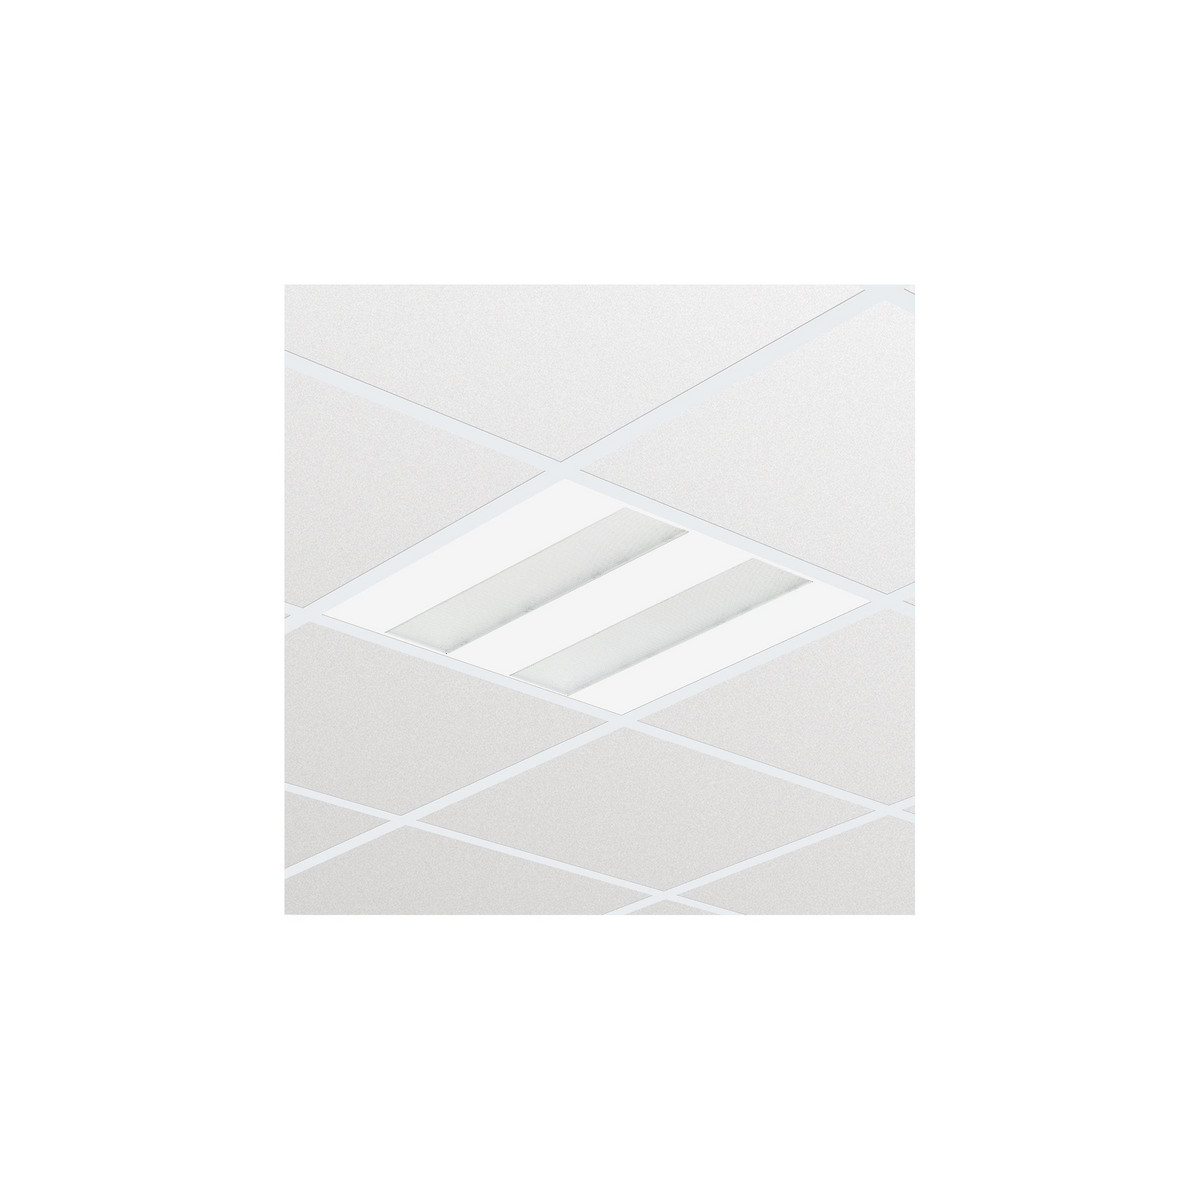 Philips FlexBlend Indbyg RC340B 3600lm/940 60x60 Synlig T-skinne PCS-optik SpaceWise